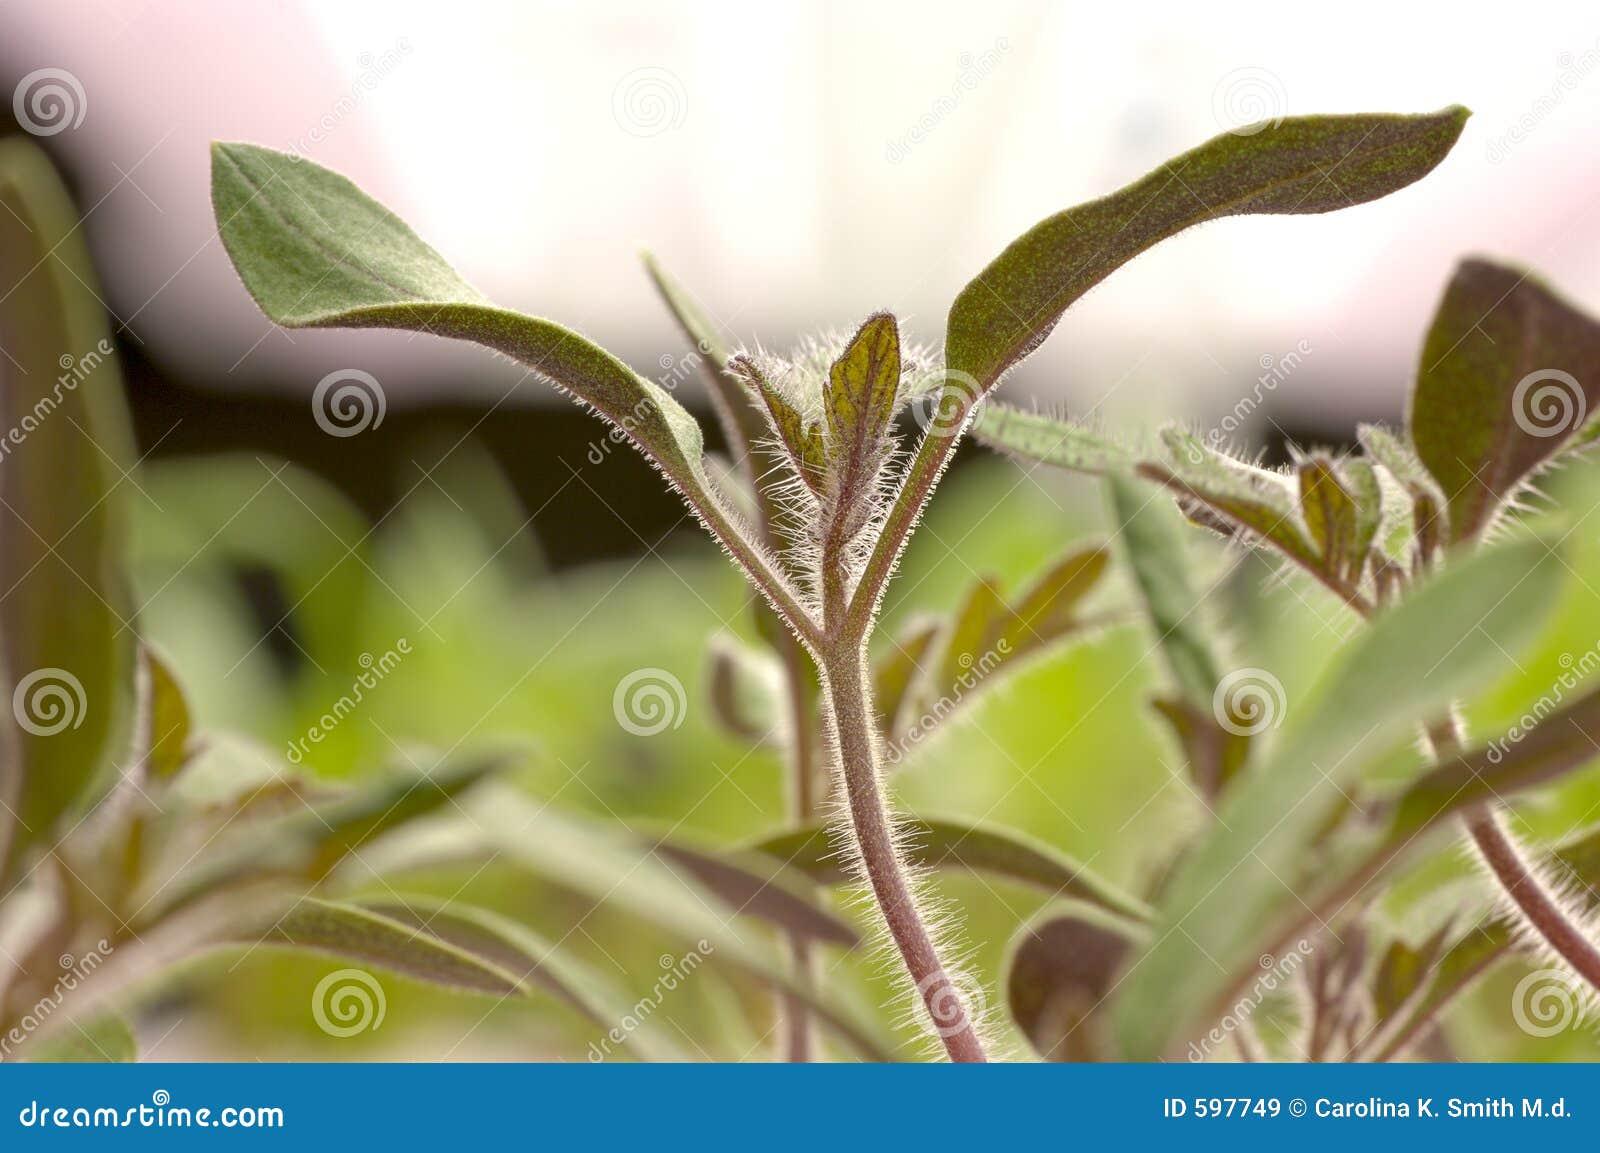 Jardinagem - Seedlings do tomate